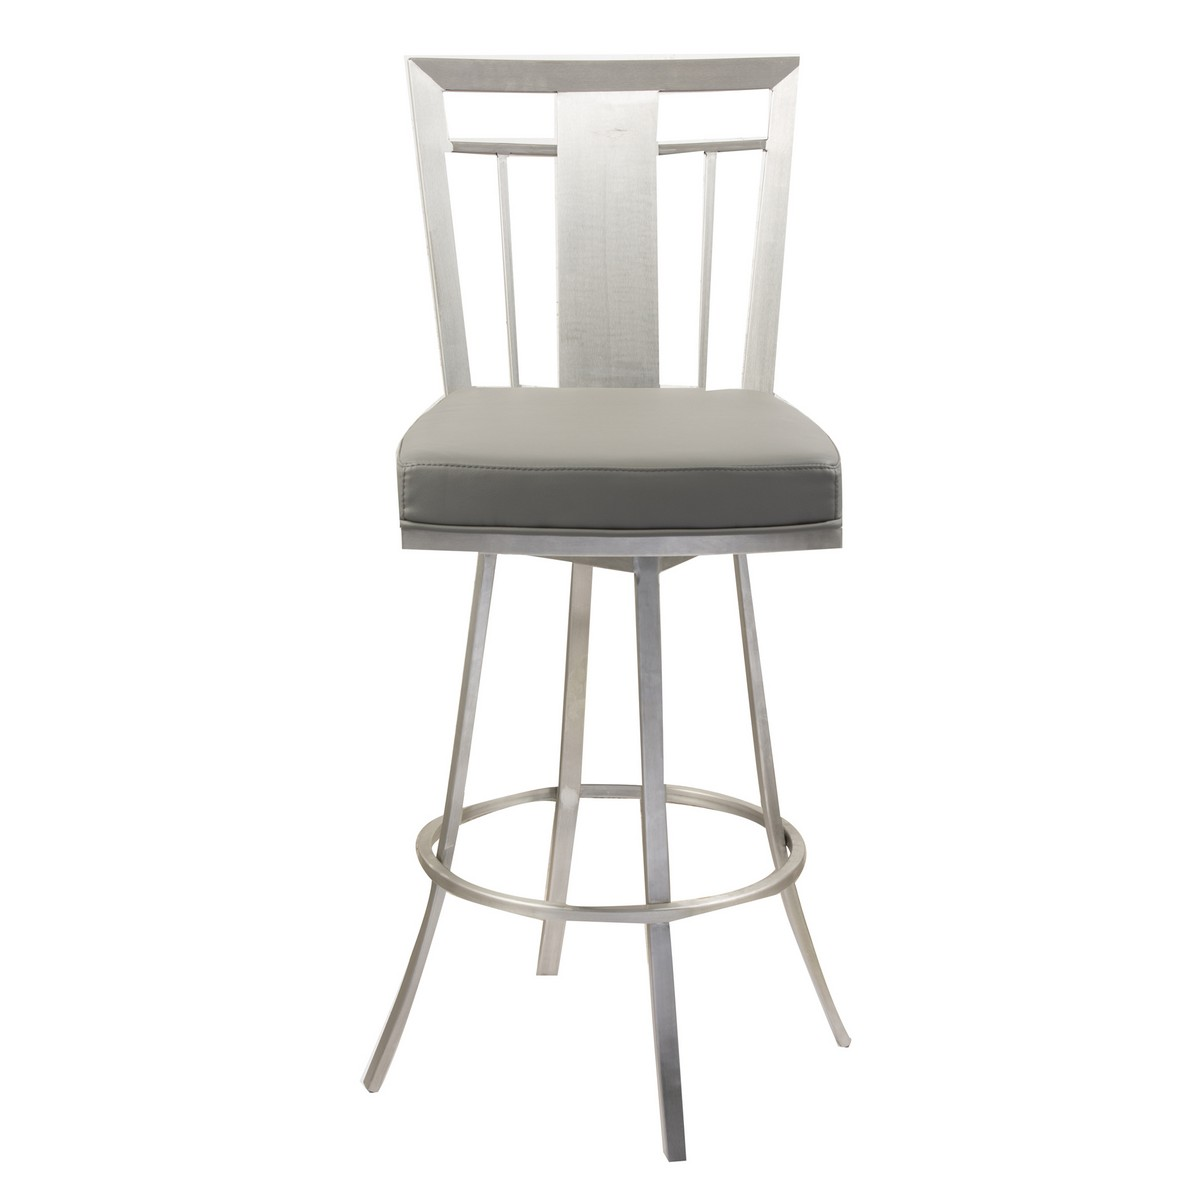 Armen Living Cleo 26-inch Modern Swivel Barstool In Gray and Stainless Steel